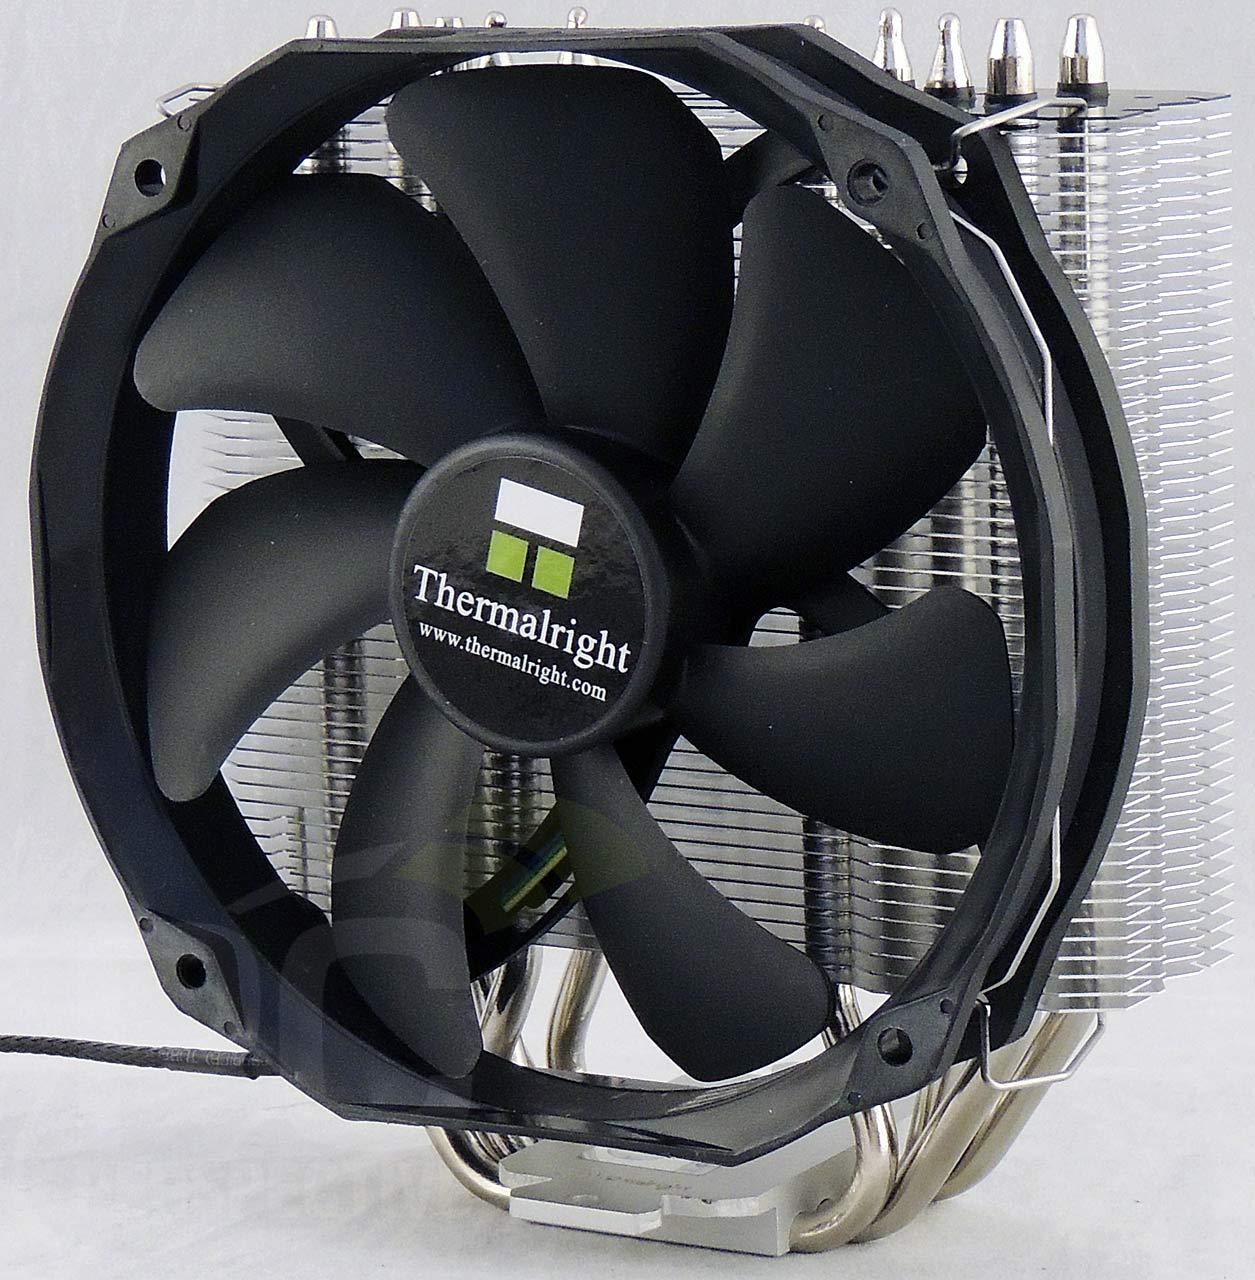 01-cooler-faninstalled-profile.jpg